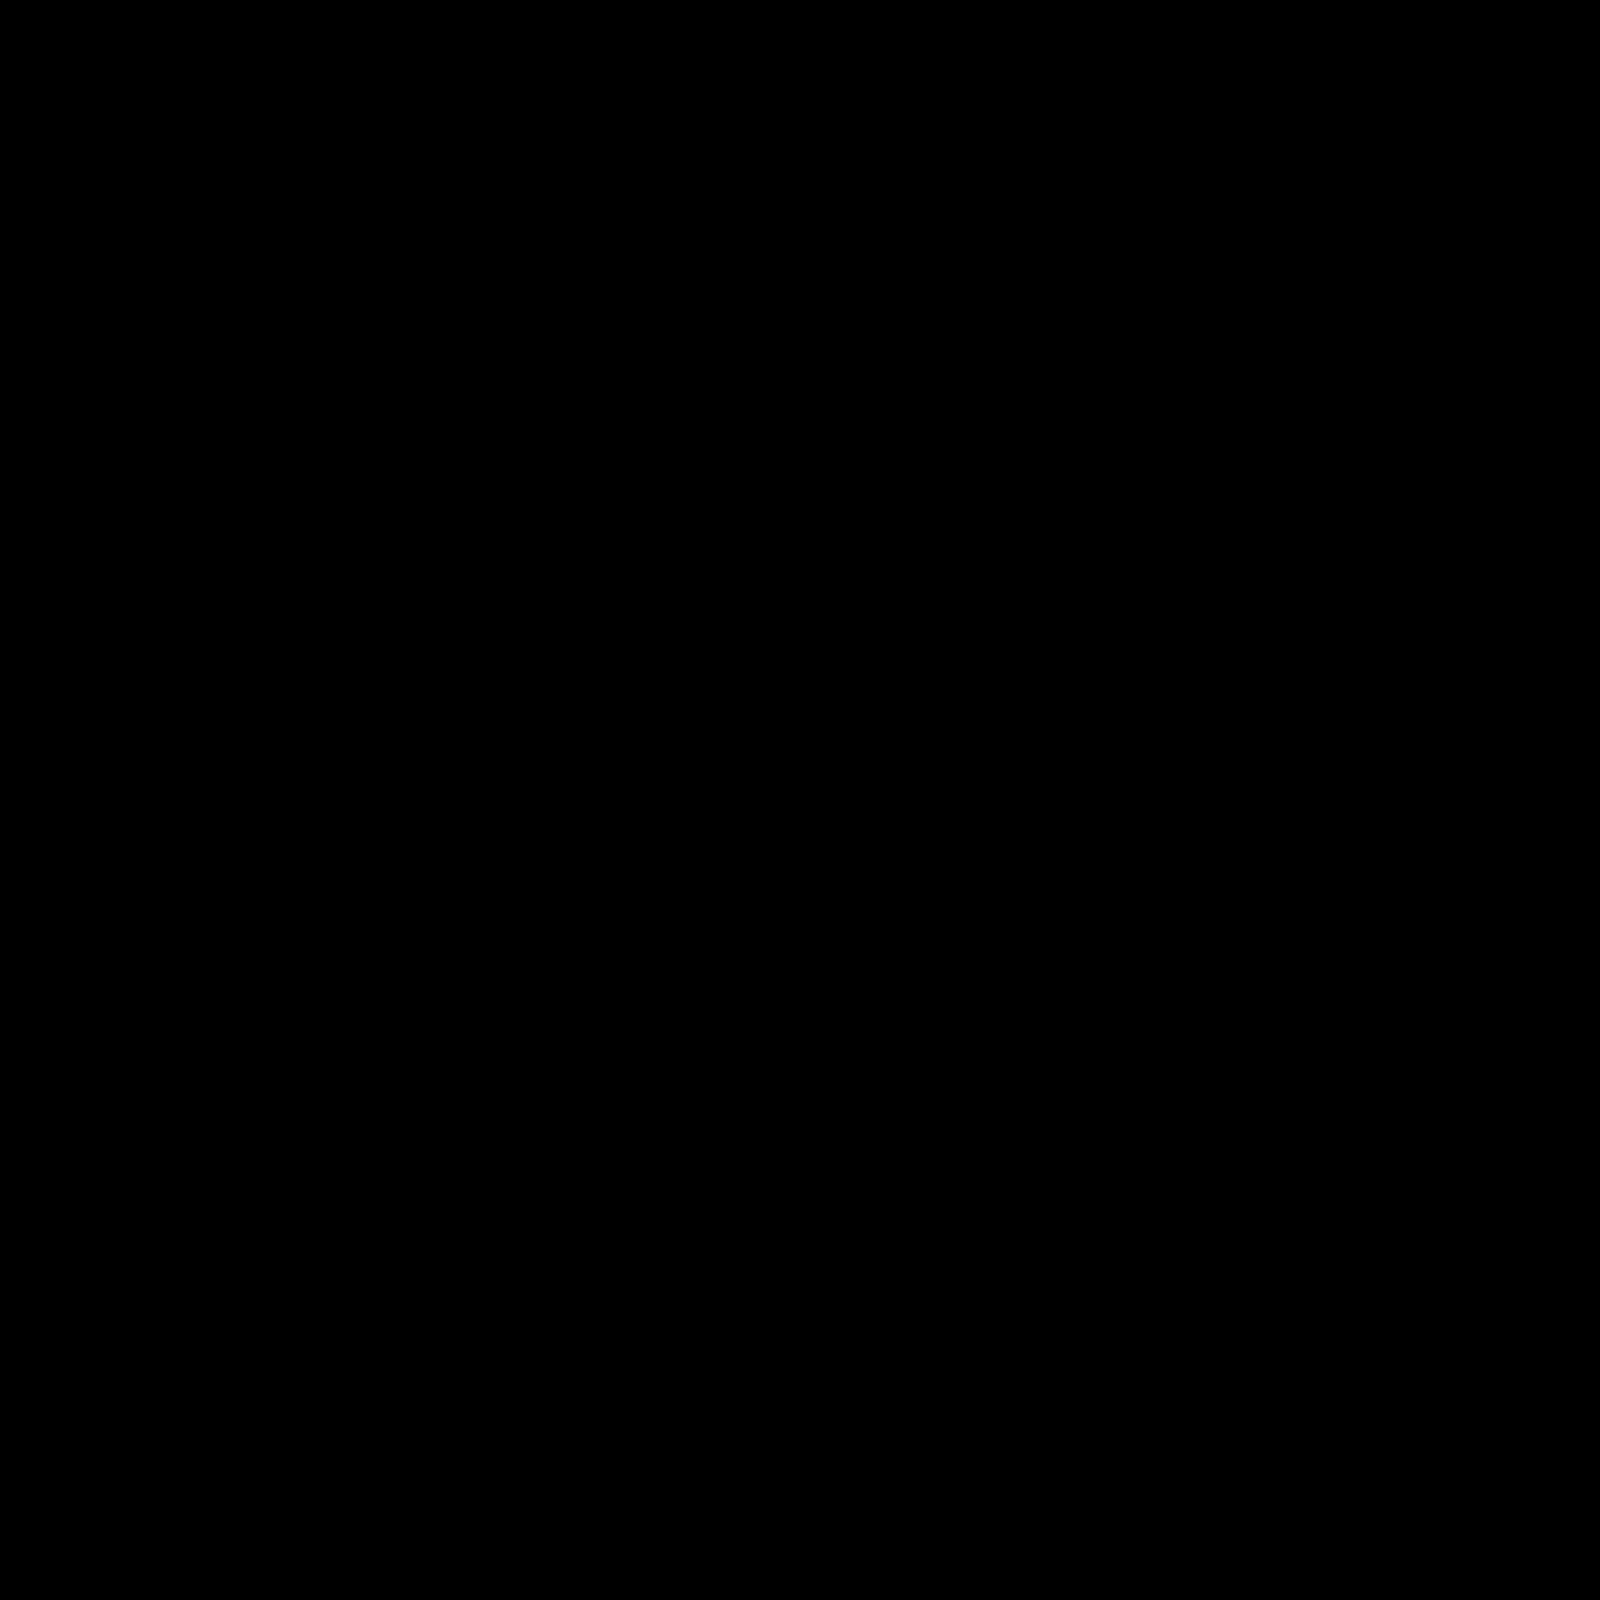 Paw PNG HD - 145707